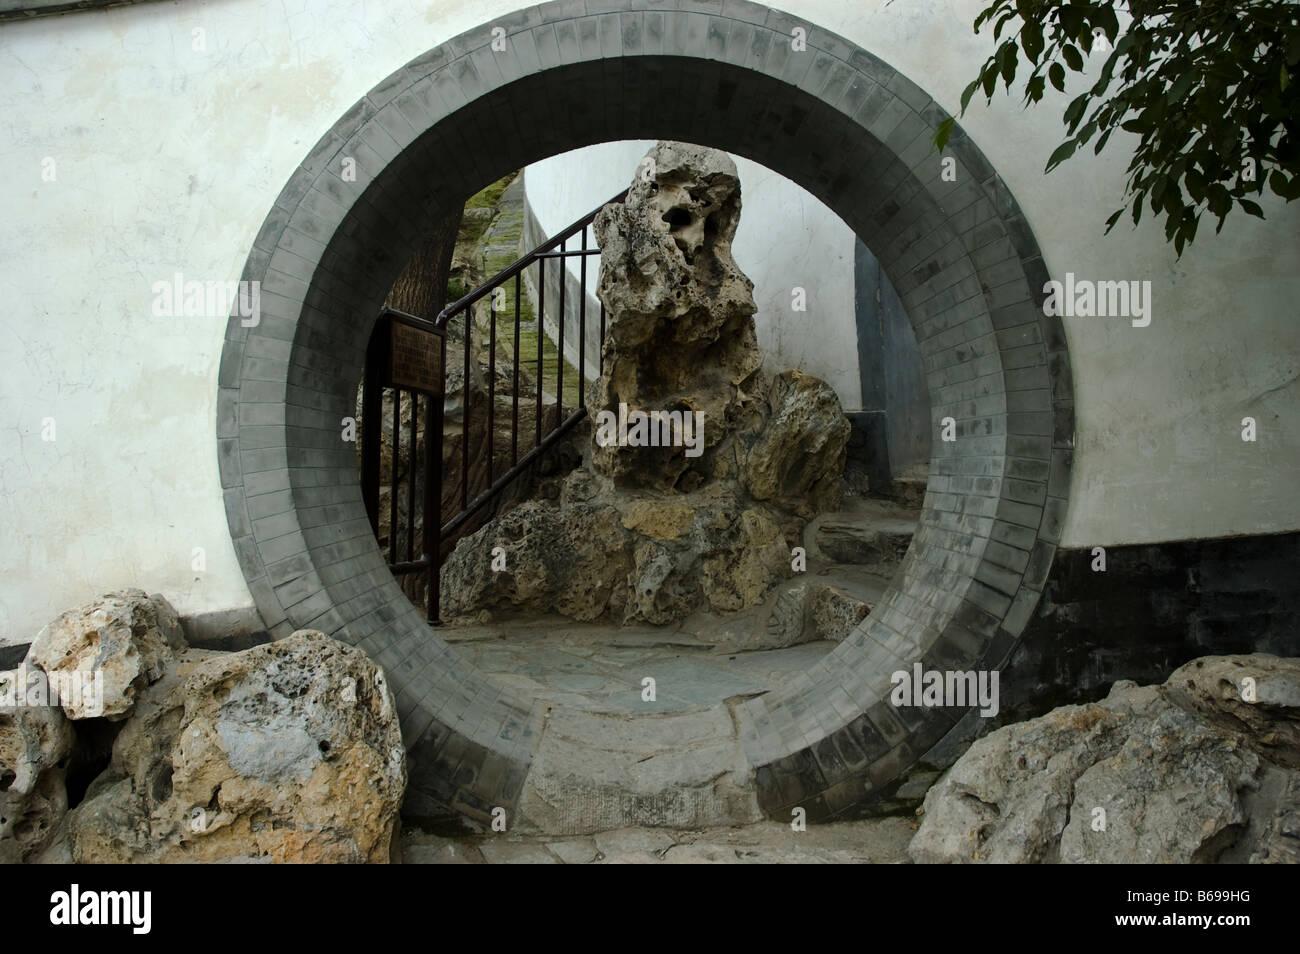 Circular Chinese door in Beihai Park Beijing - Stock Image & Chinese Round Door Stock Photos u0026 Chinese Round Door Stock Images ...